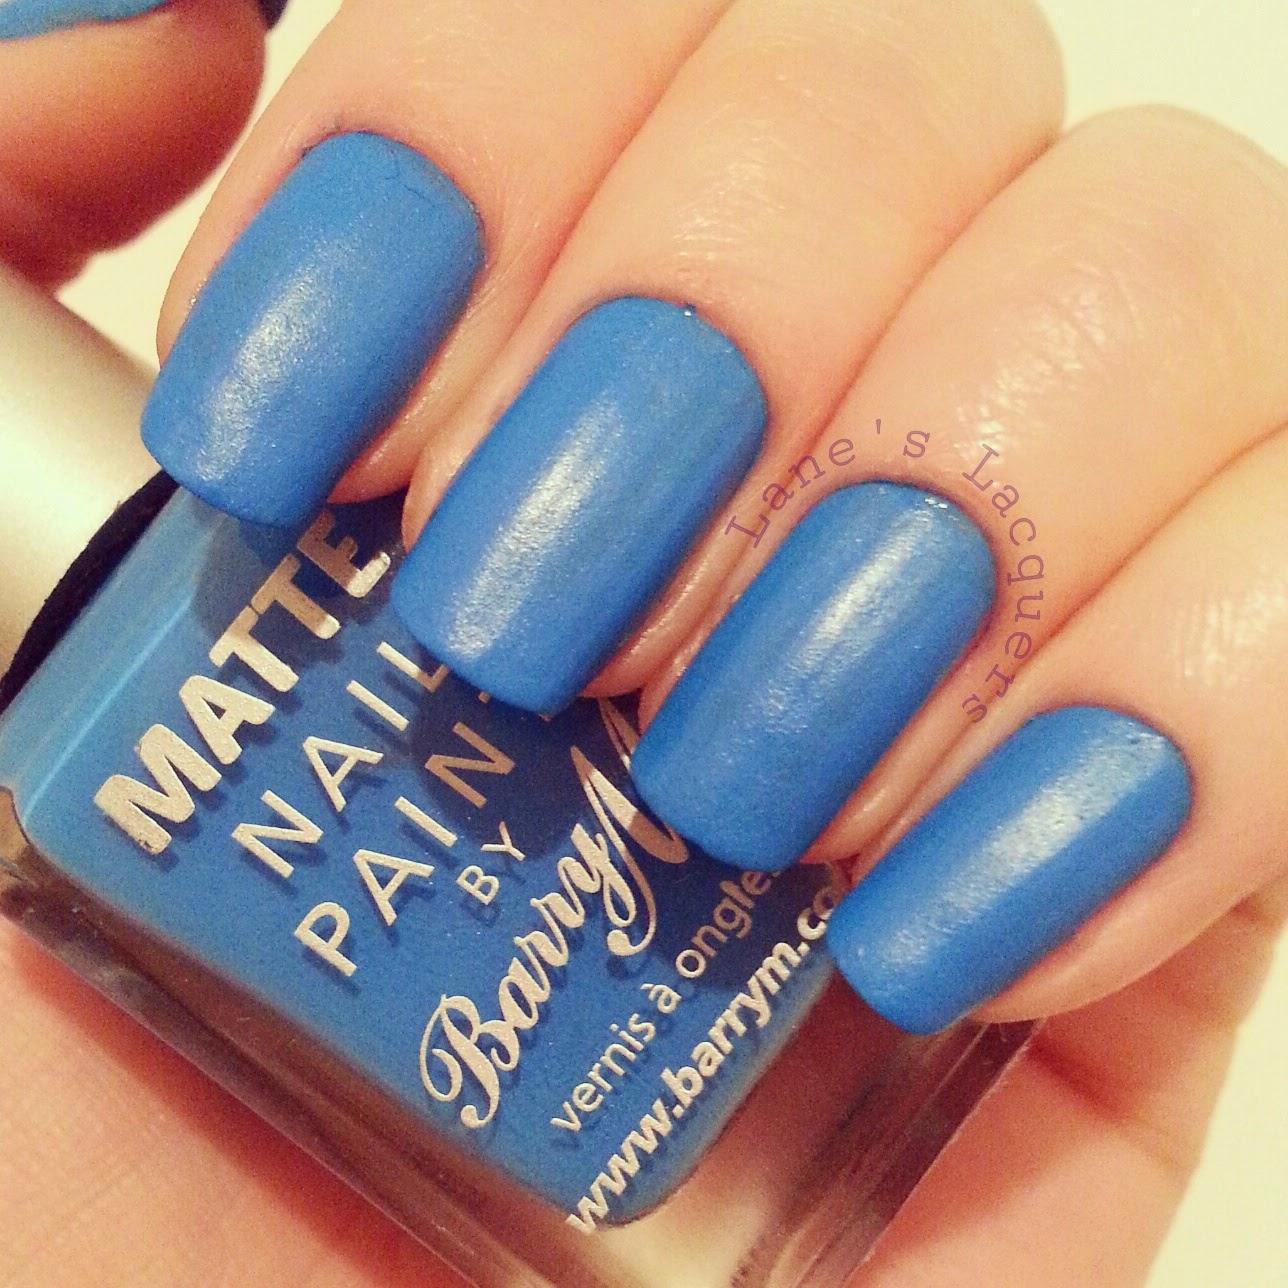 barry-m-malibu-swatch-manicure (2)